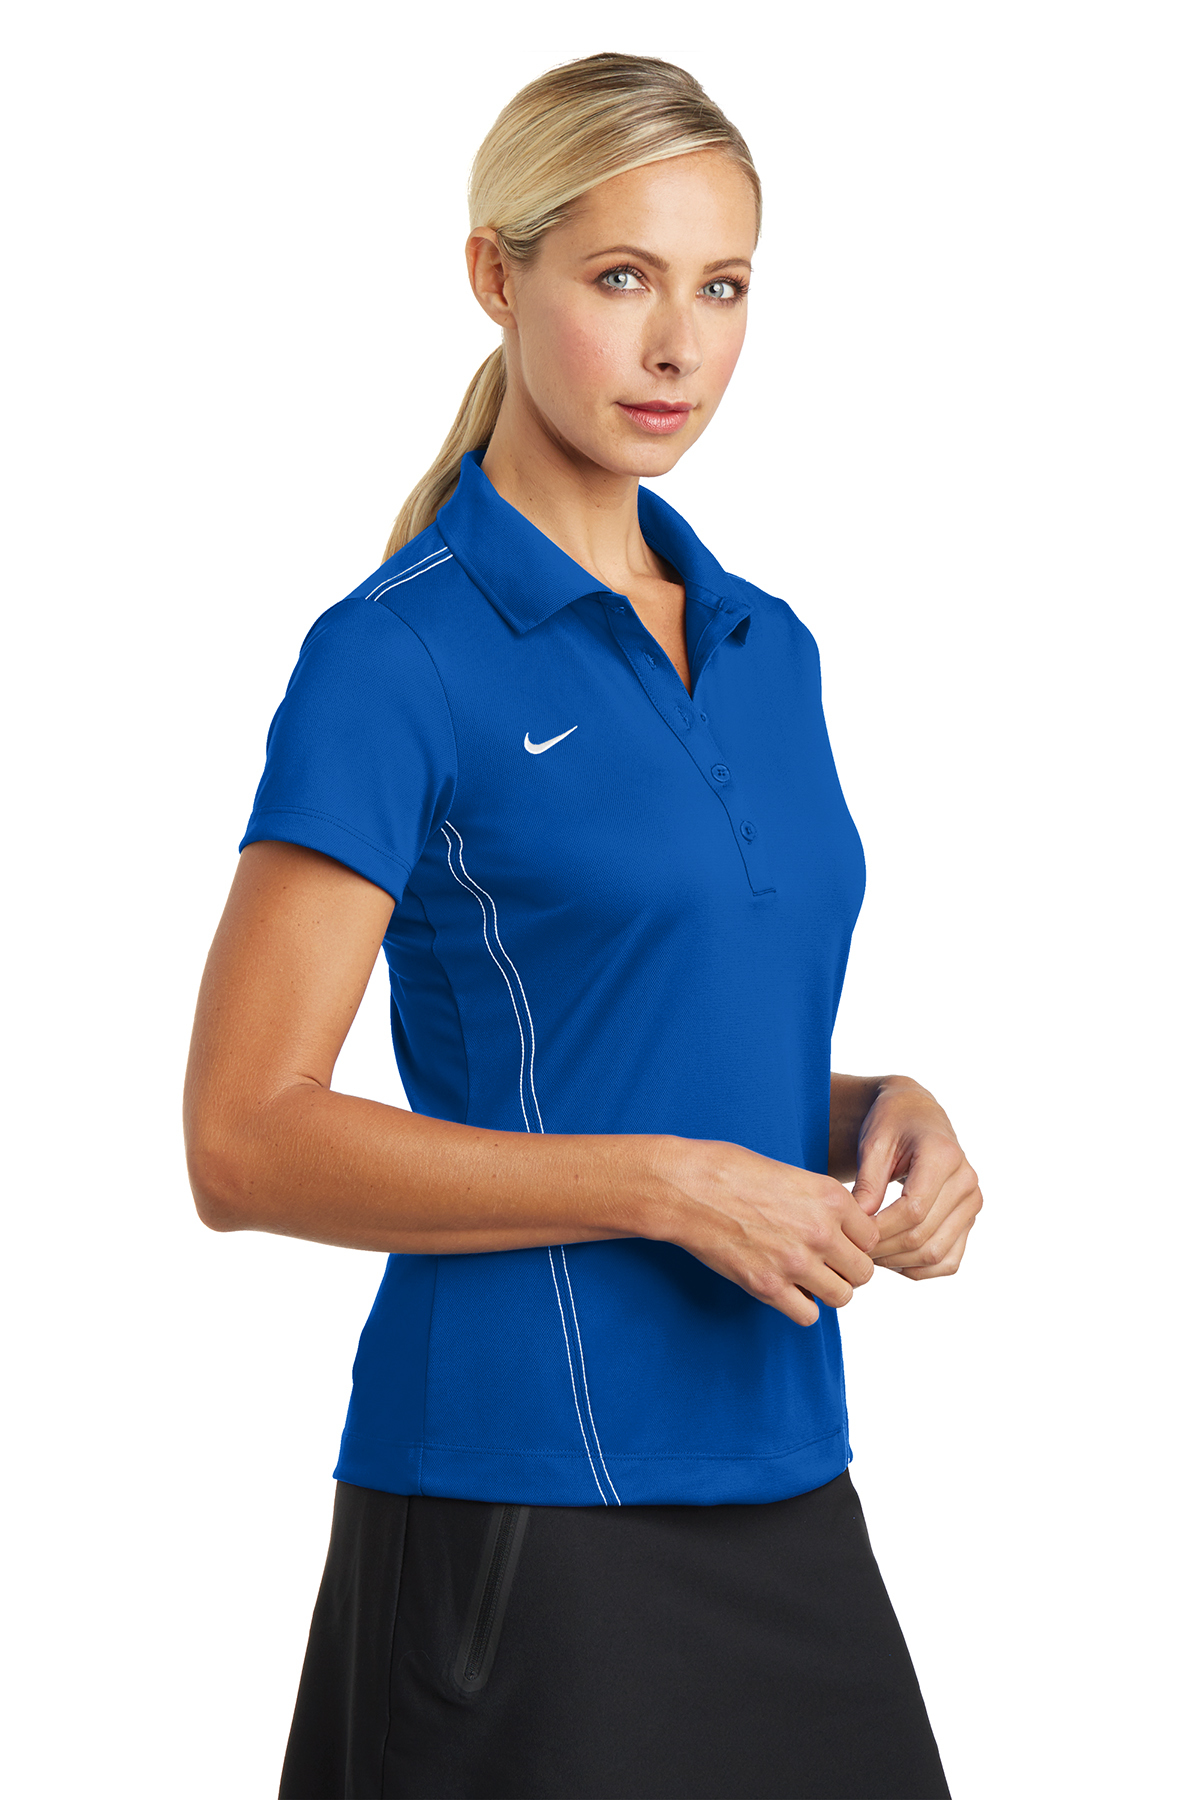 Nike Ladies Dri Fit Sport Swoosh Pique Polo Ladies Women